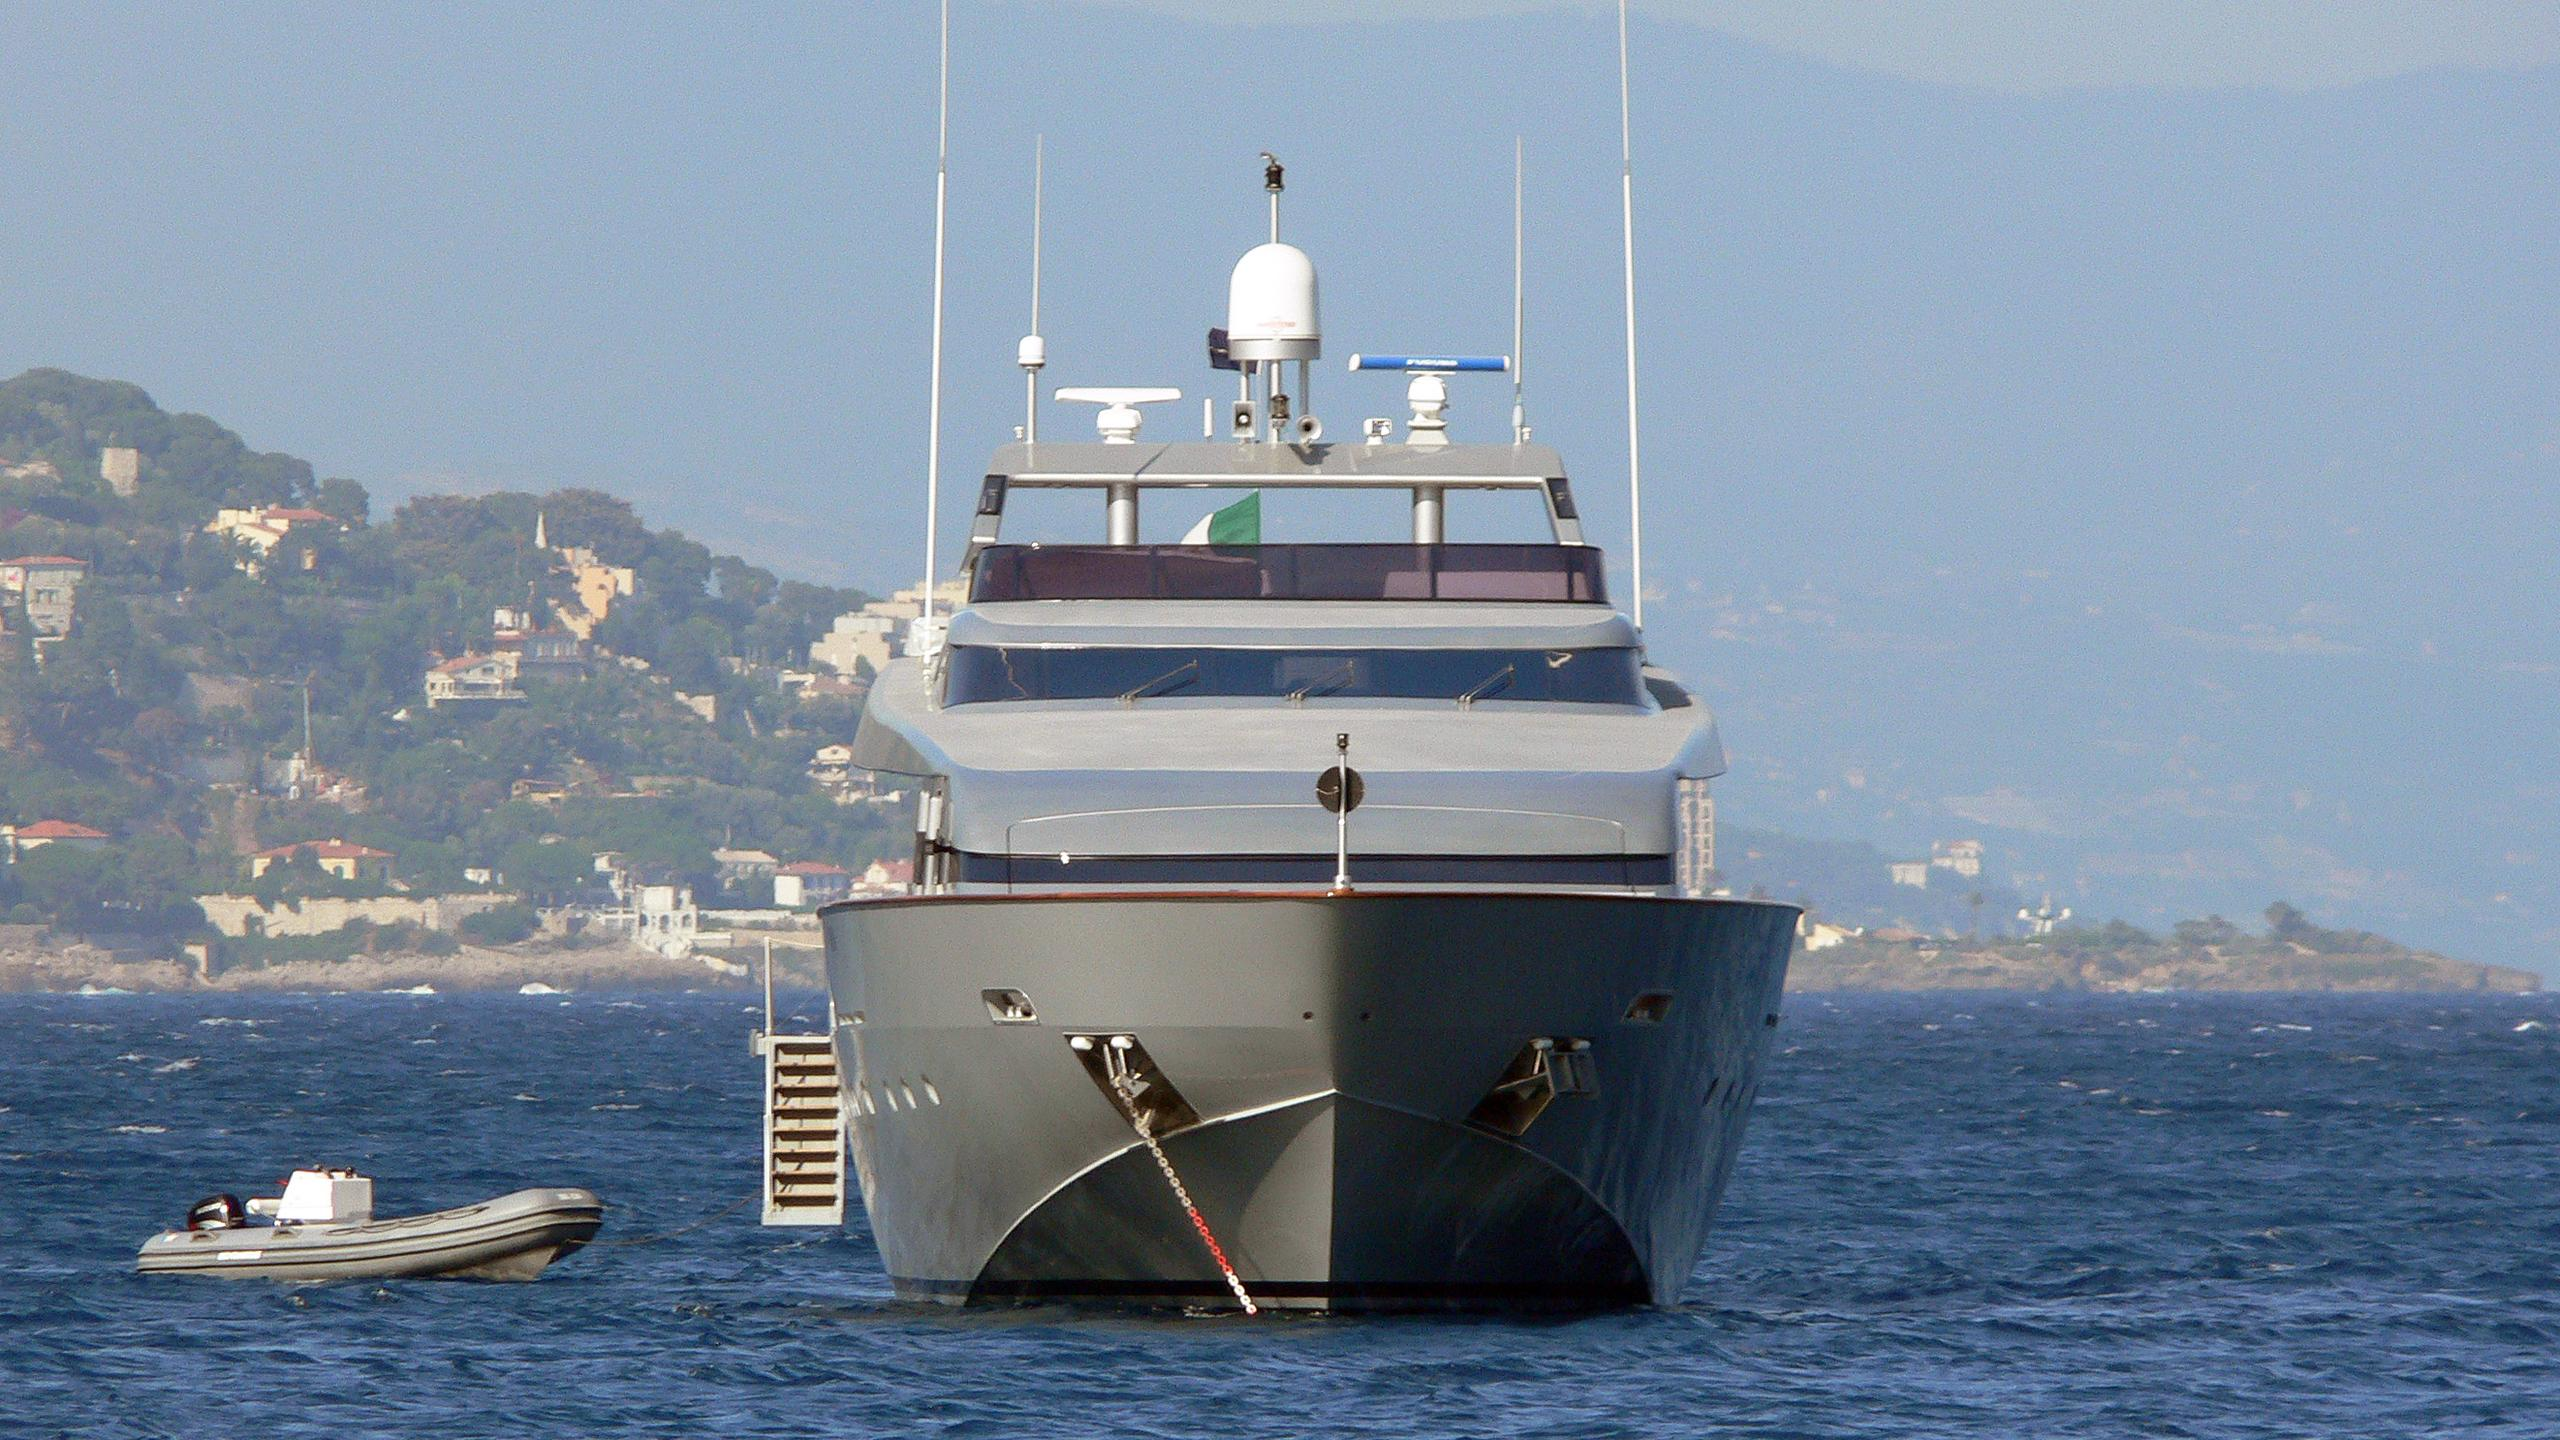 thunderball-motor-yacht-baglietto-2001§-34m-bow